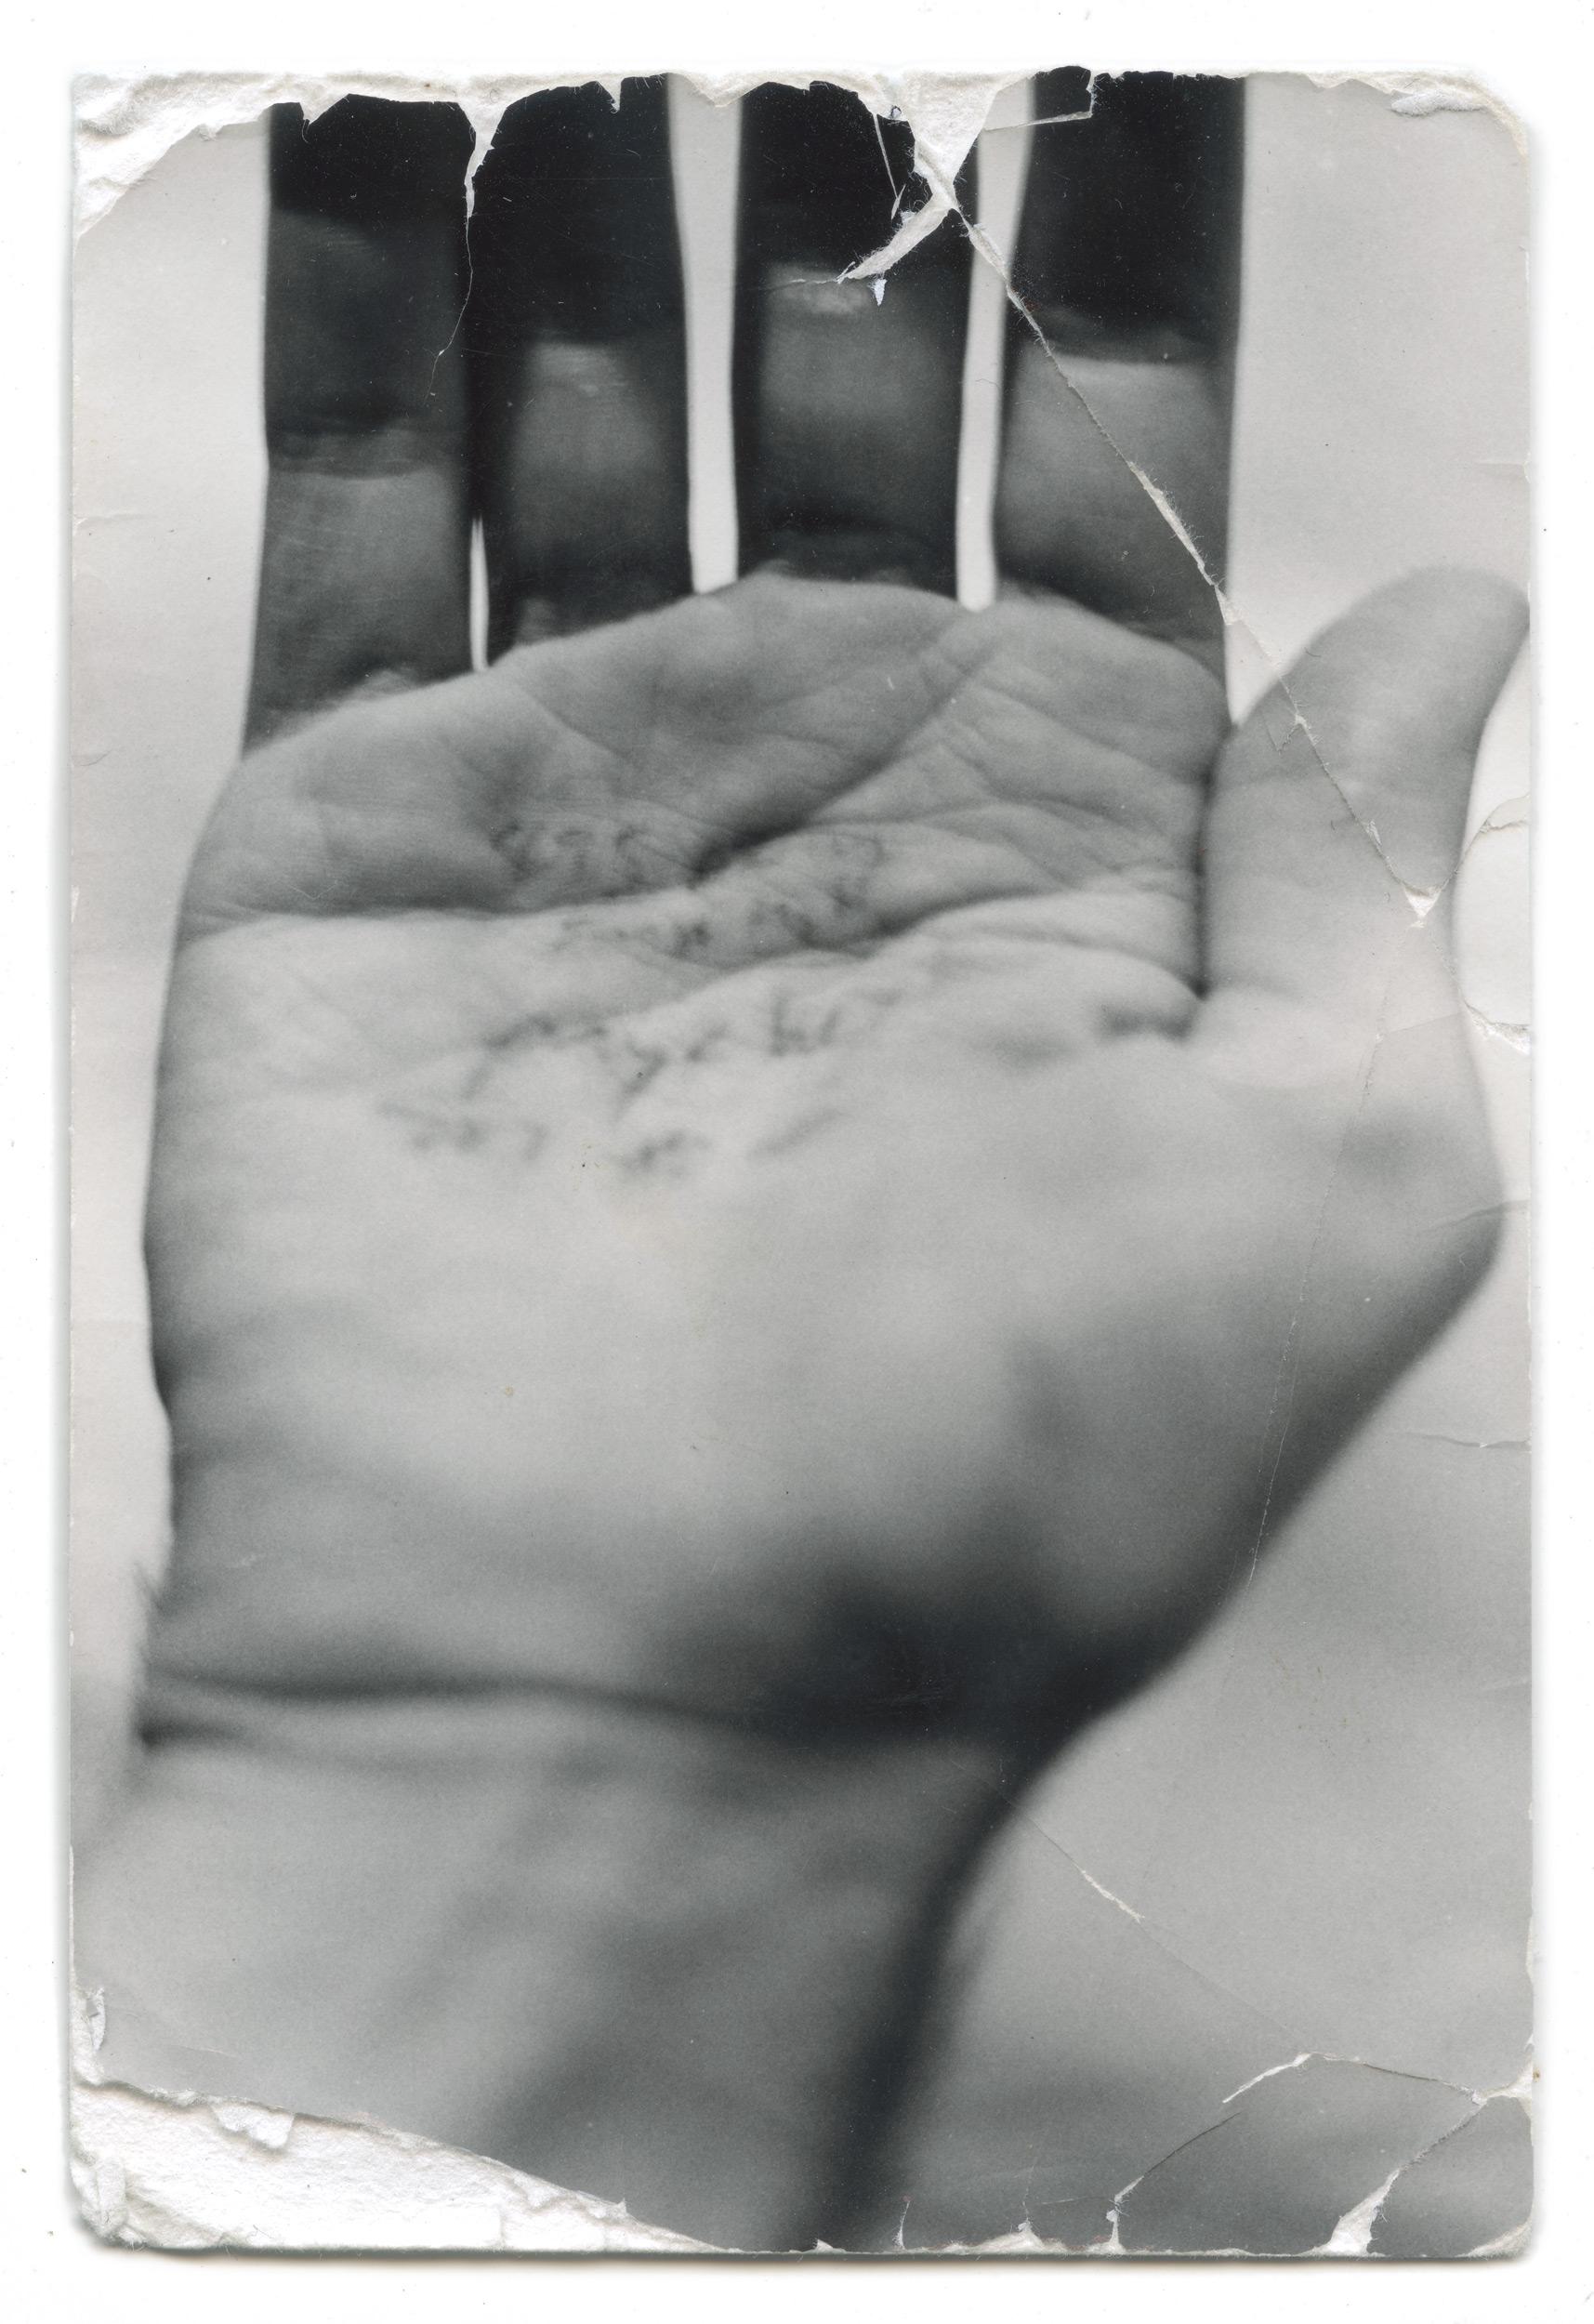 noncorpum xx, an old hand